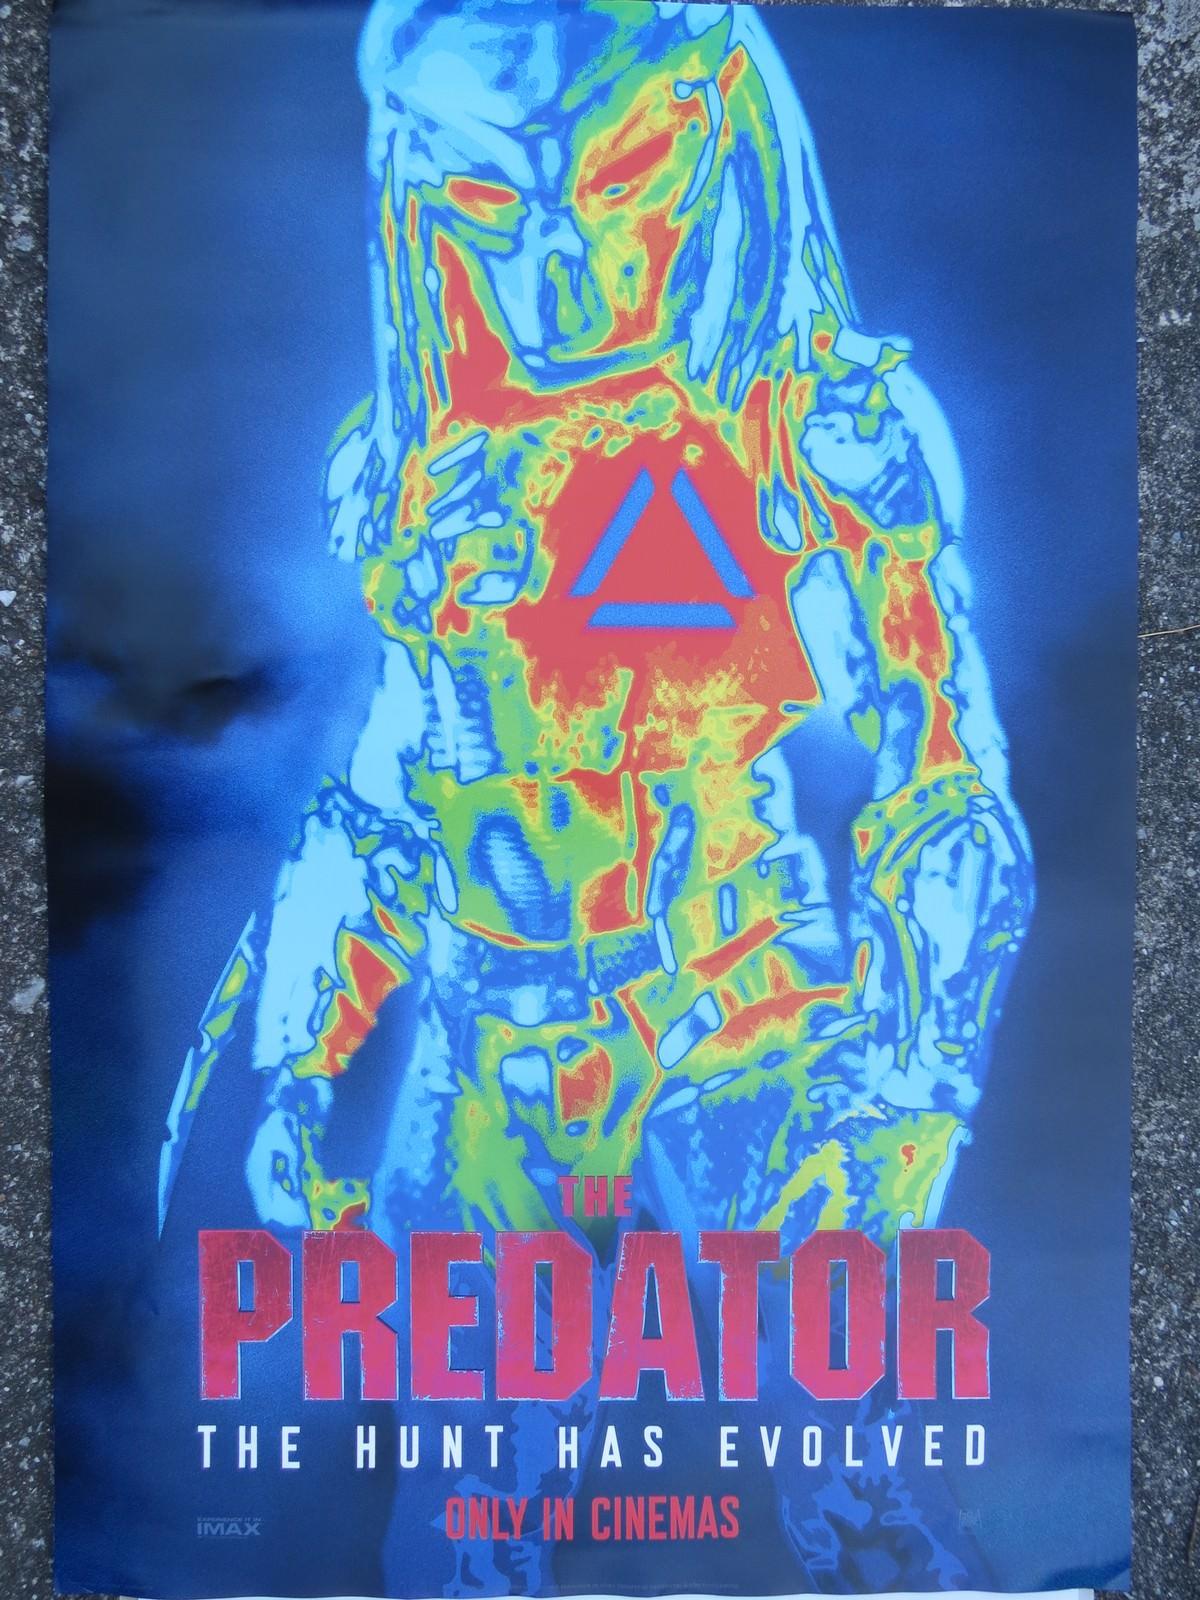 Movie, The Predator(美國, 2018) / 終極戰士:掠奪者(台) / 铁血战士(中) / 鐵血戰士:血獸進化(港), 原版電影海報